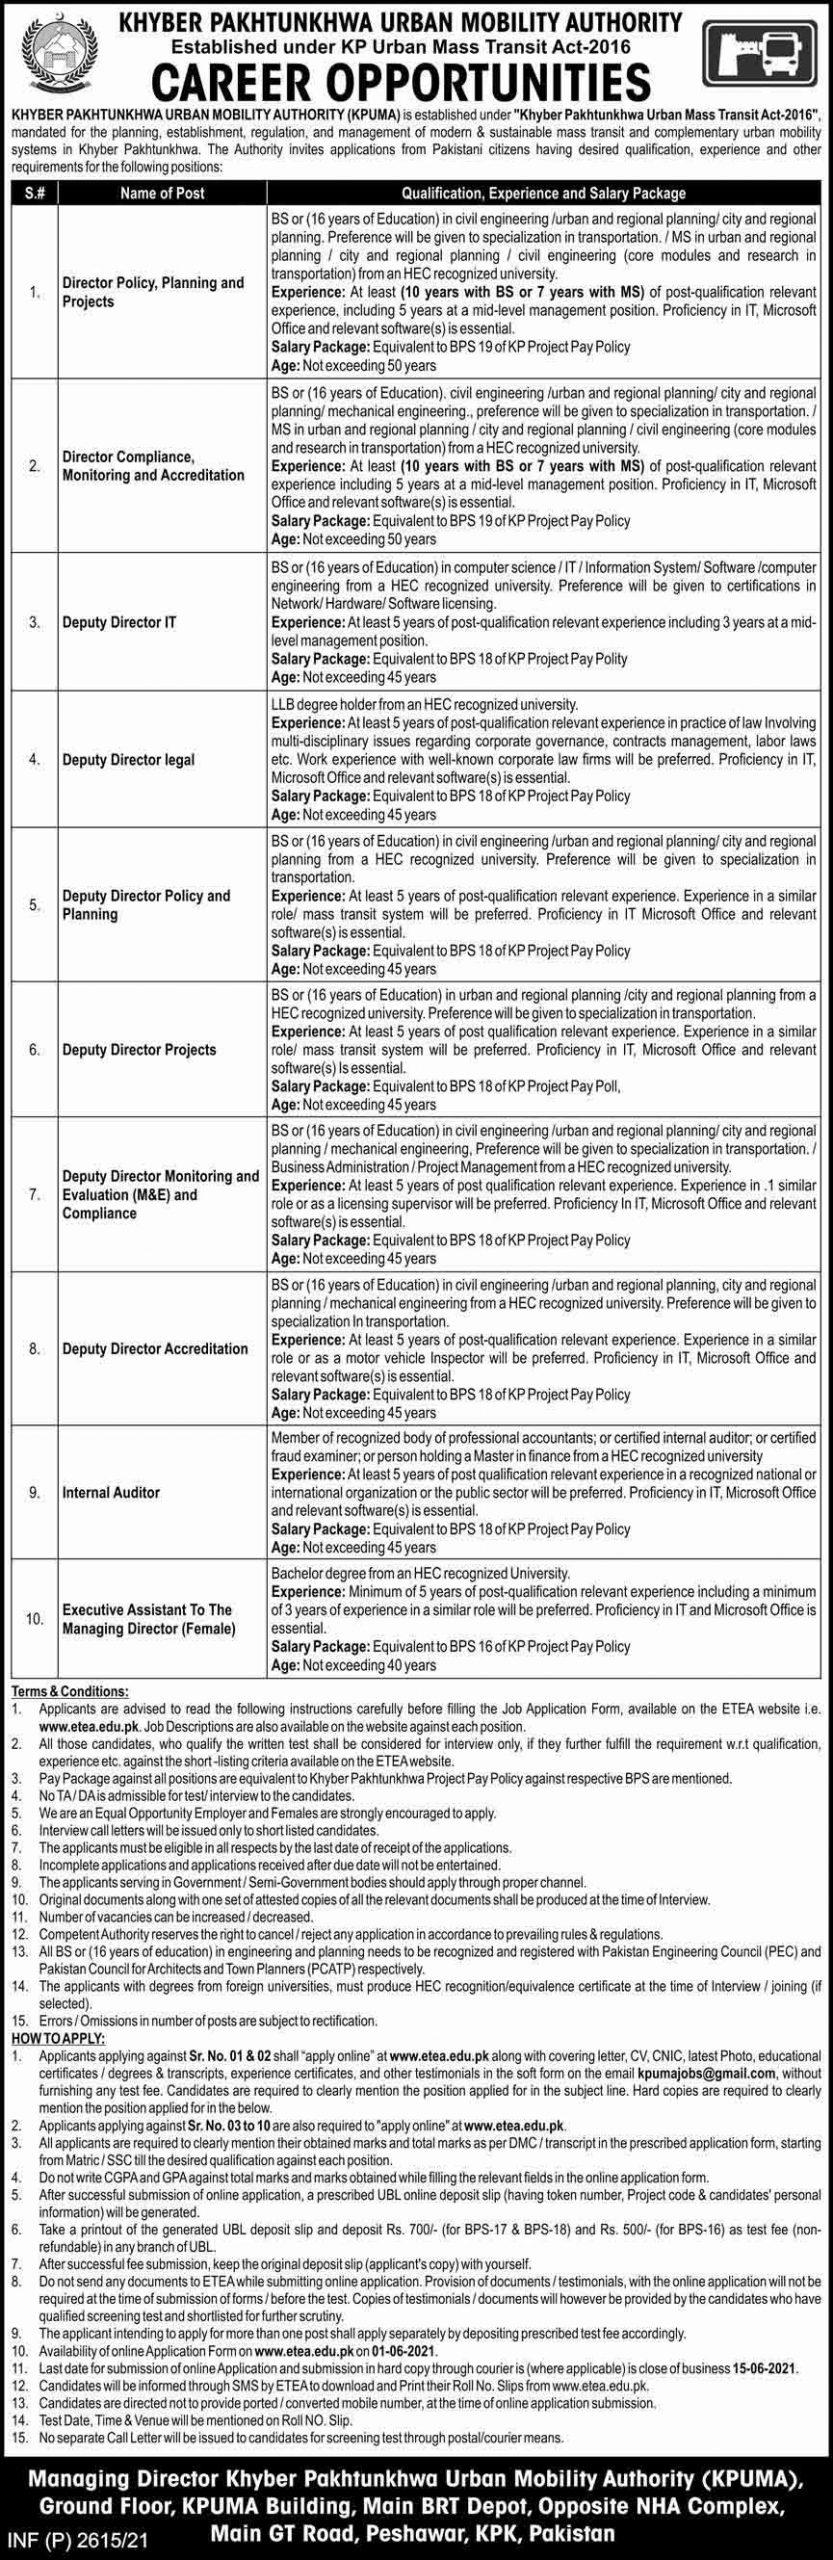 KPK Urban Mobility Authority (KPUMA) Jobs May 2021